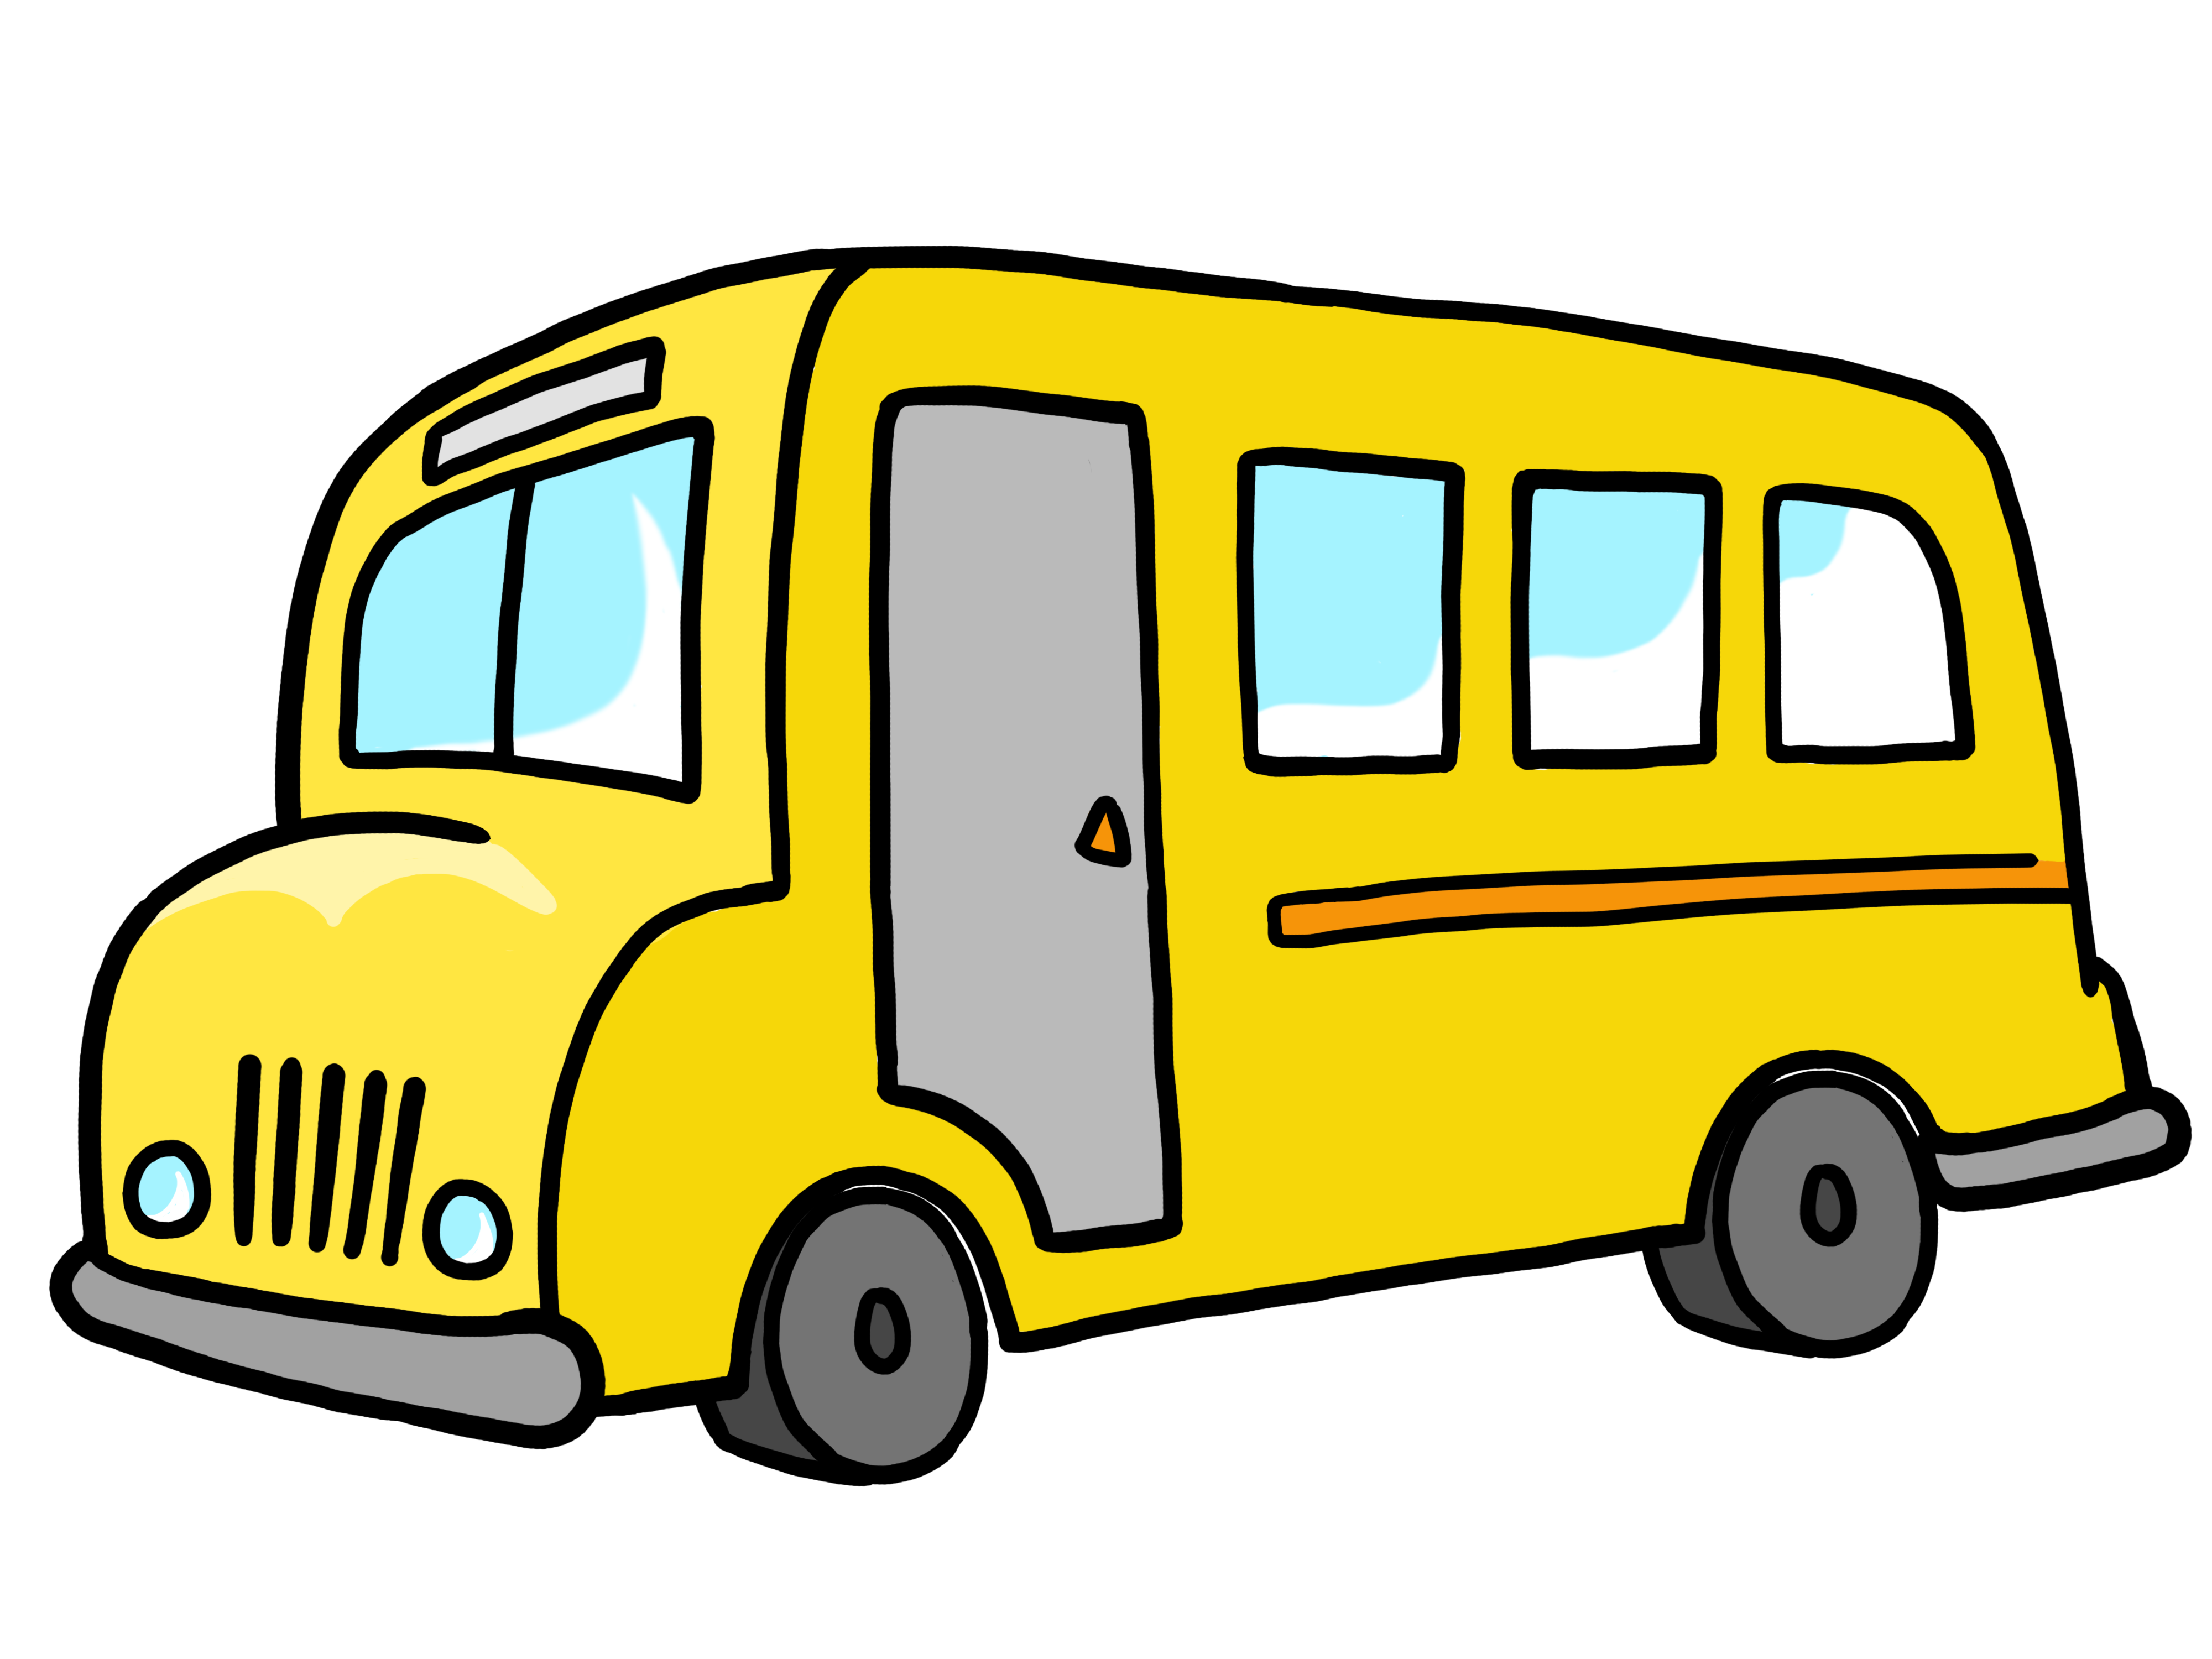 4000x3000 Cute School Bus Clip Art Free Clipart Images